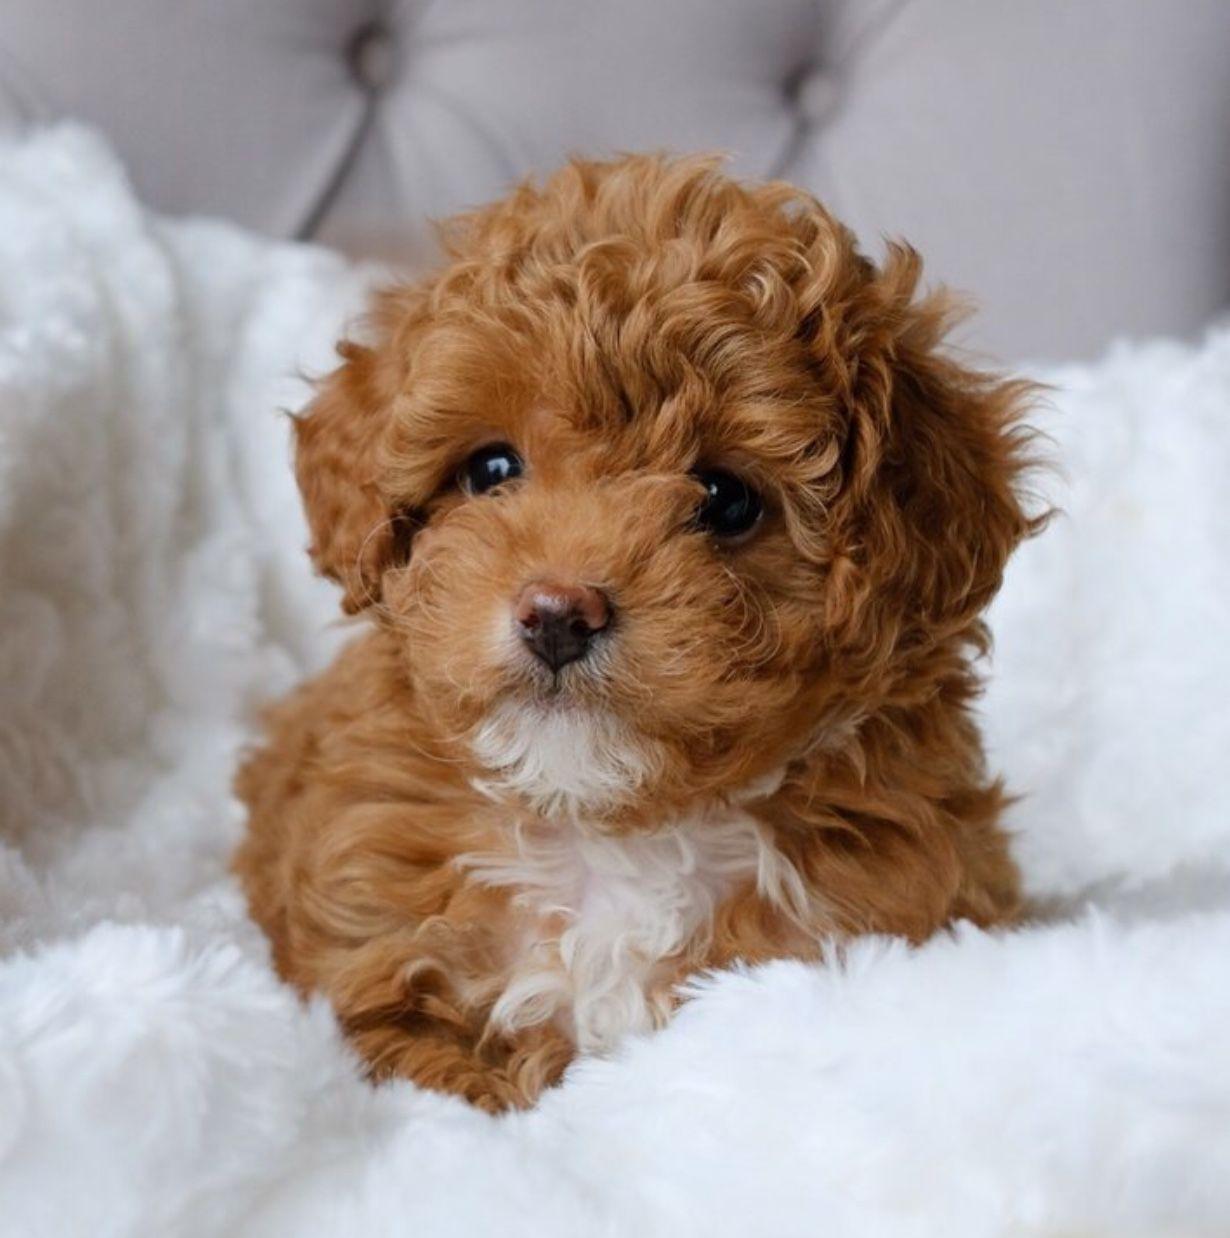 My Next Puppy A Cavapoochon Grace Puppies Cat Care Dog Friends